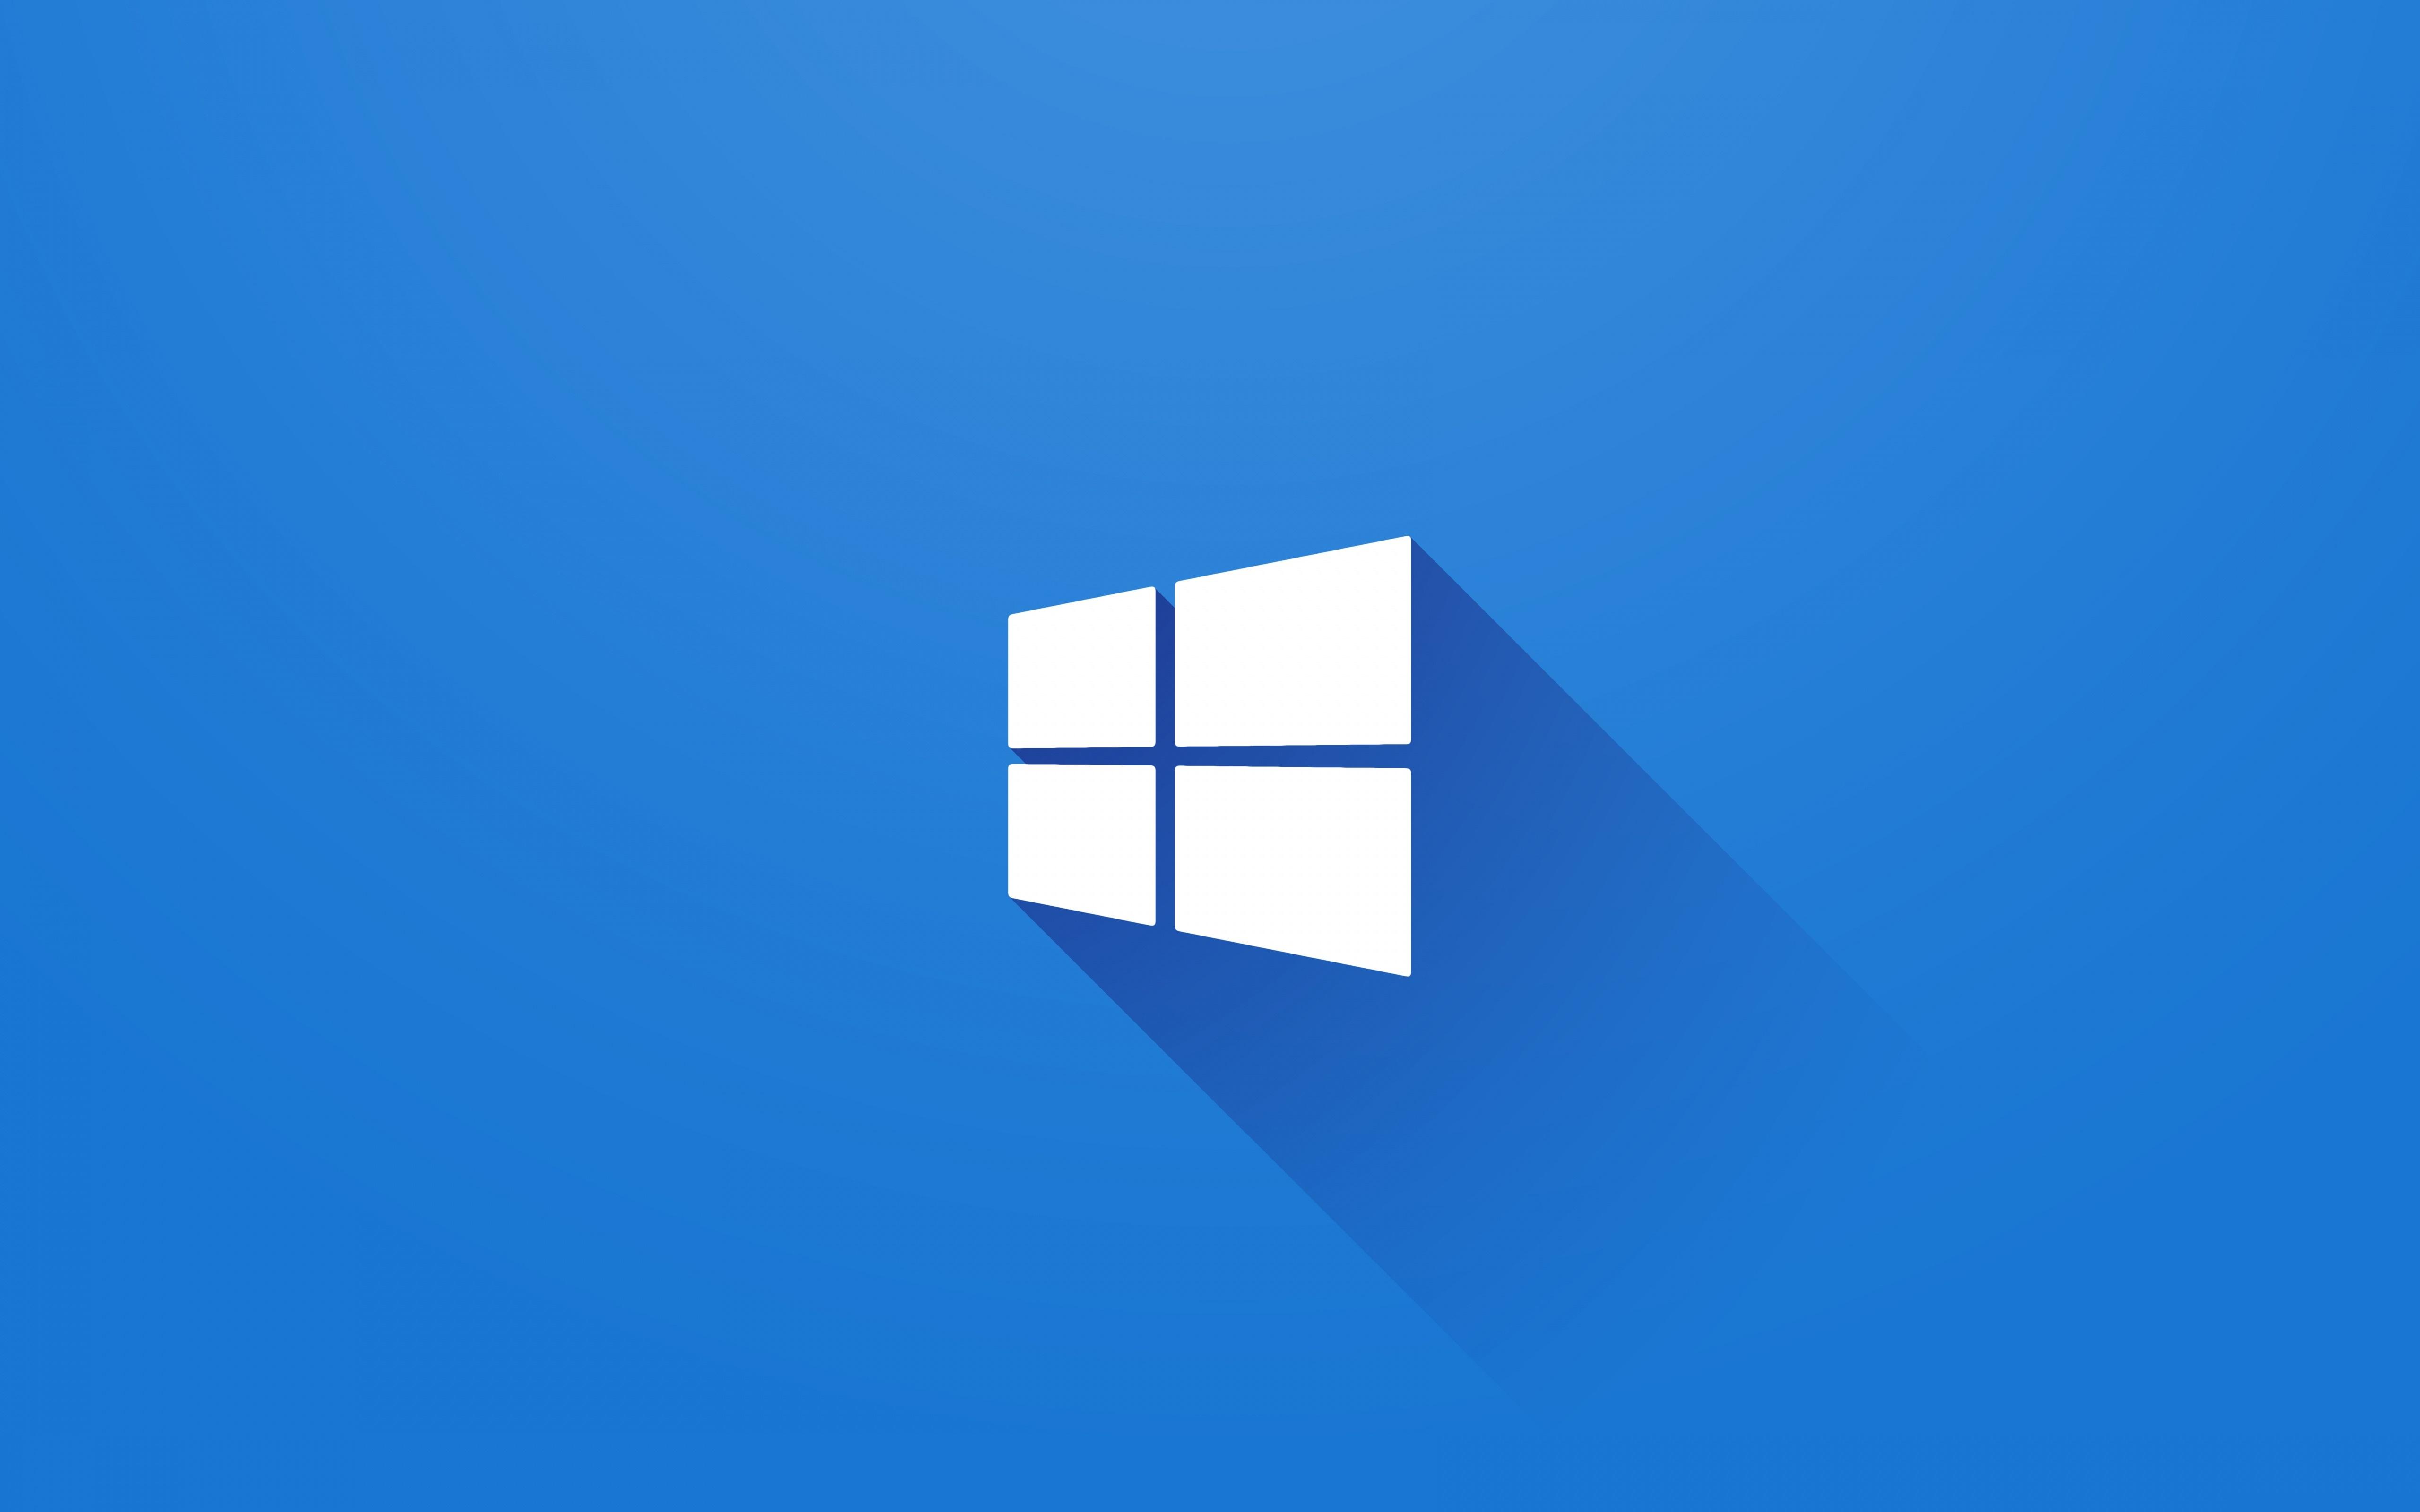 windows10 fond ecran wallpaper 1 5120x3200